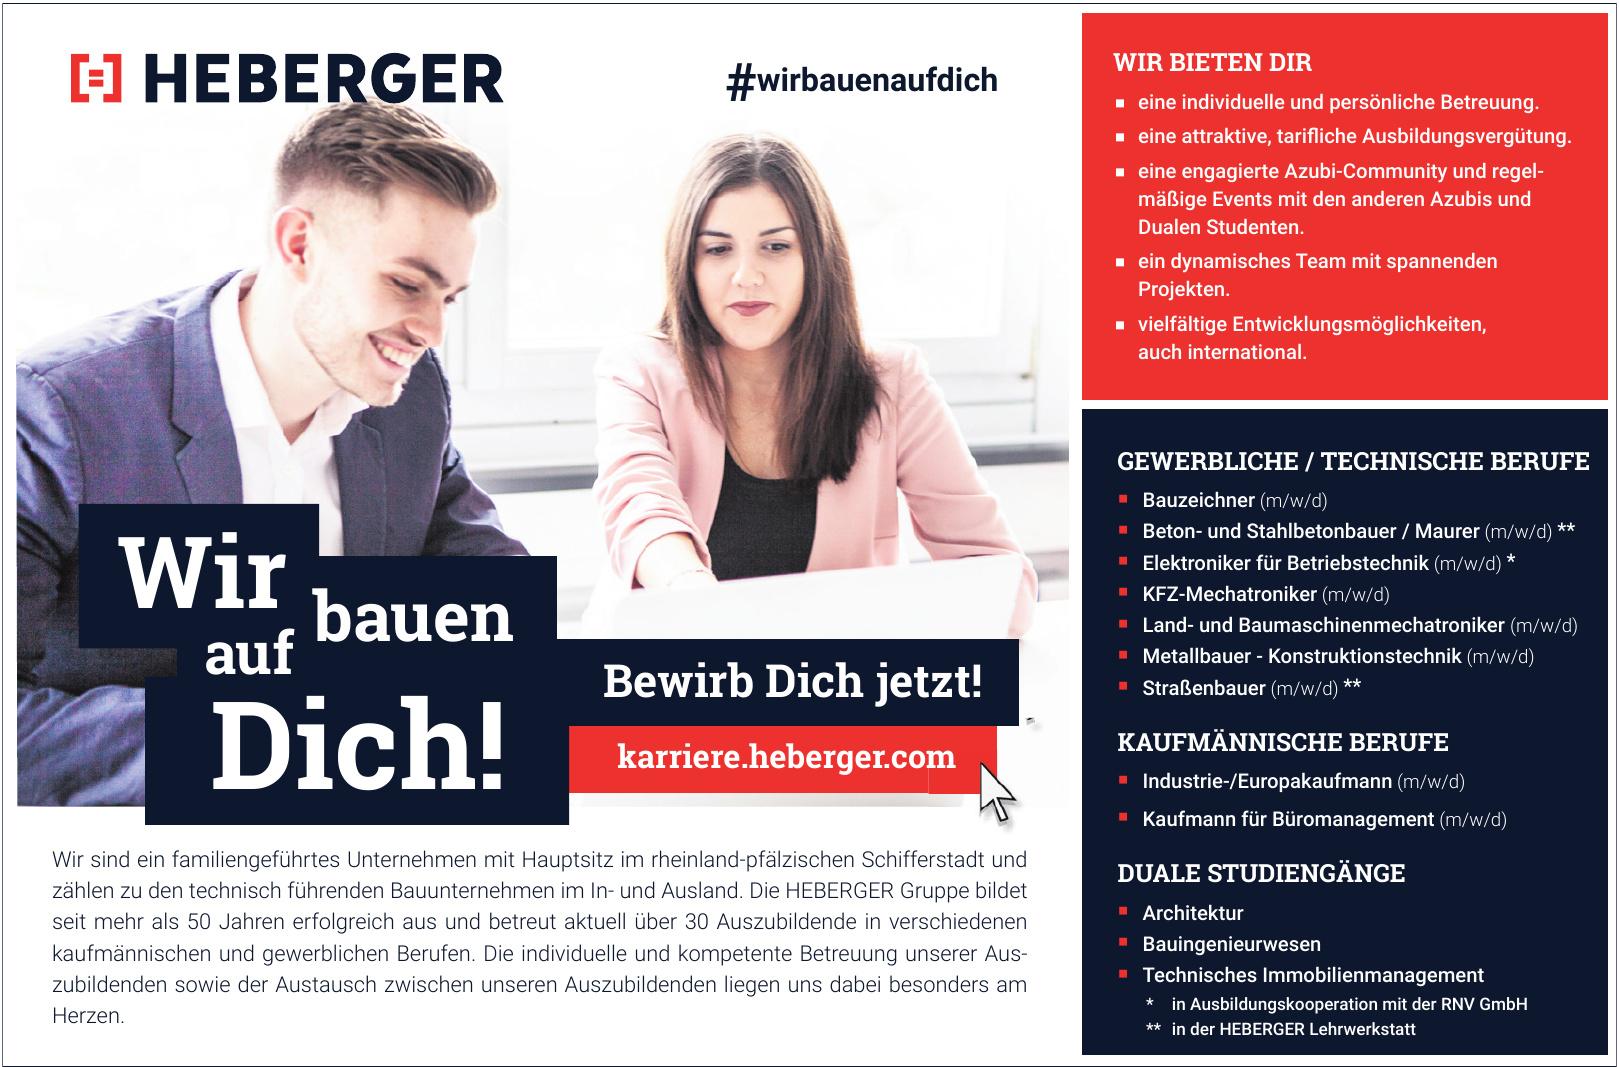 Heberger